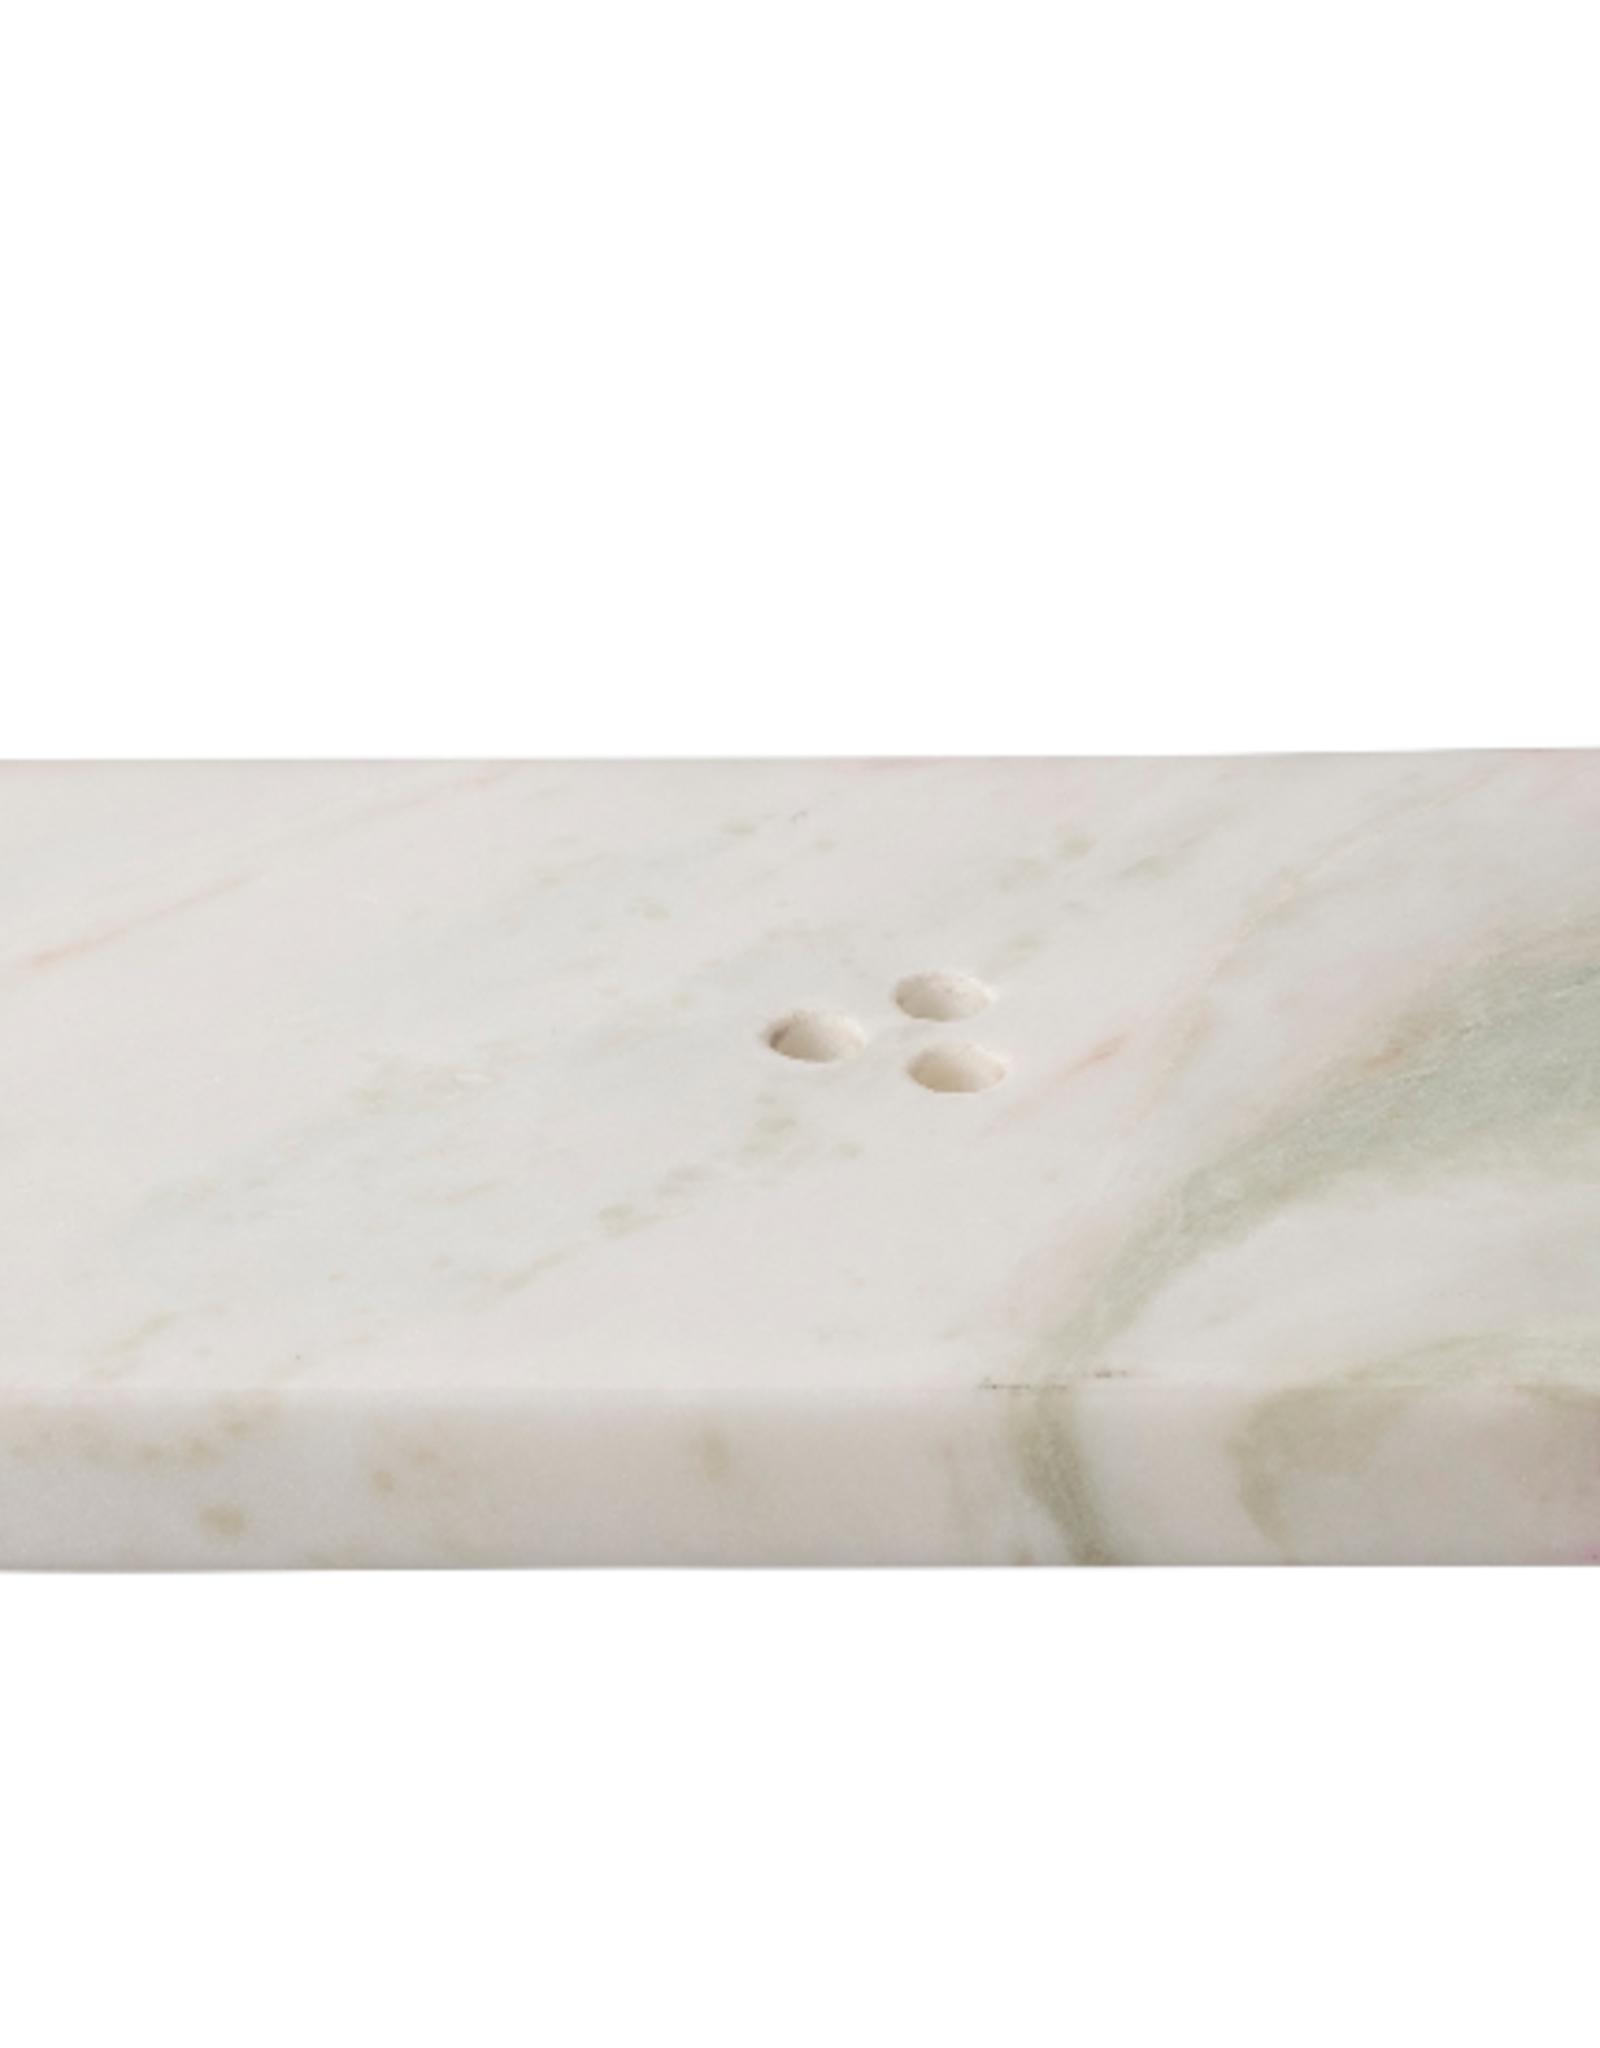 Wellmark Wellmark - Mable soap dish